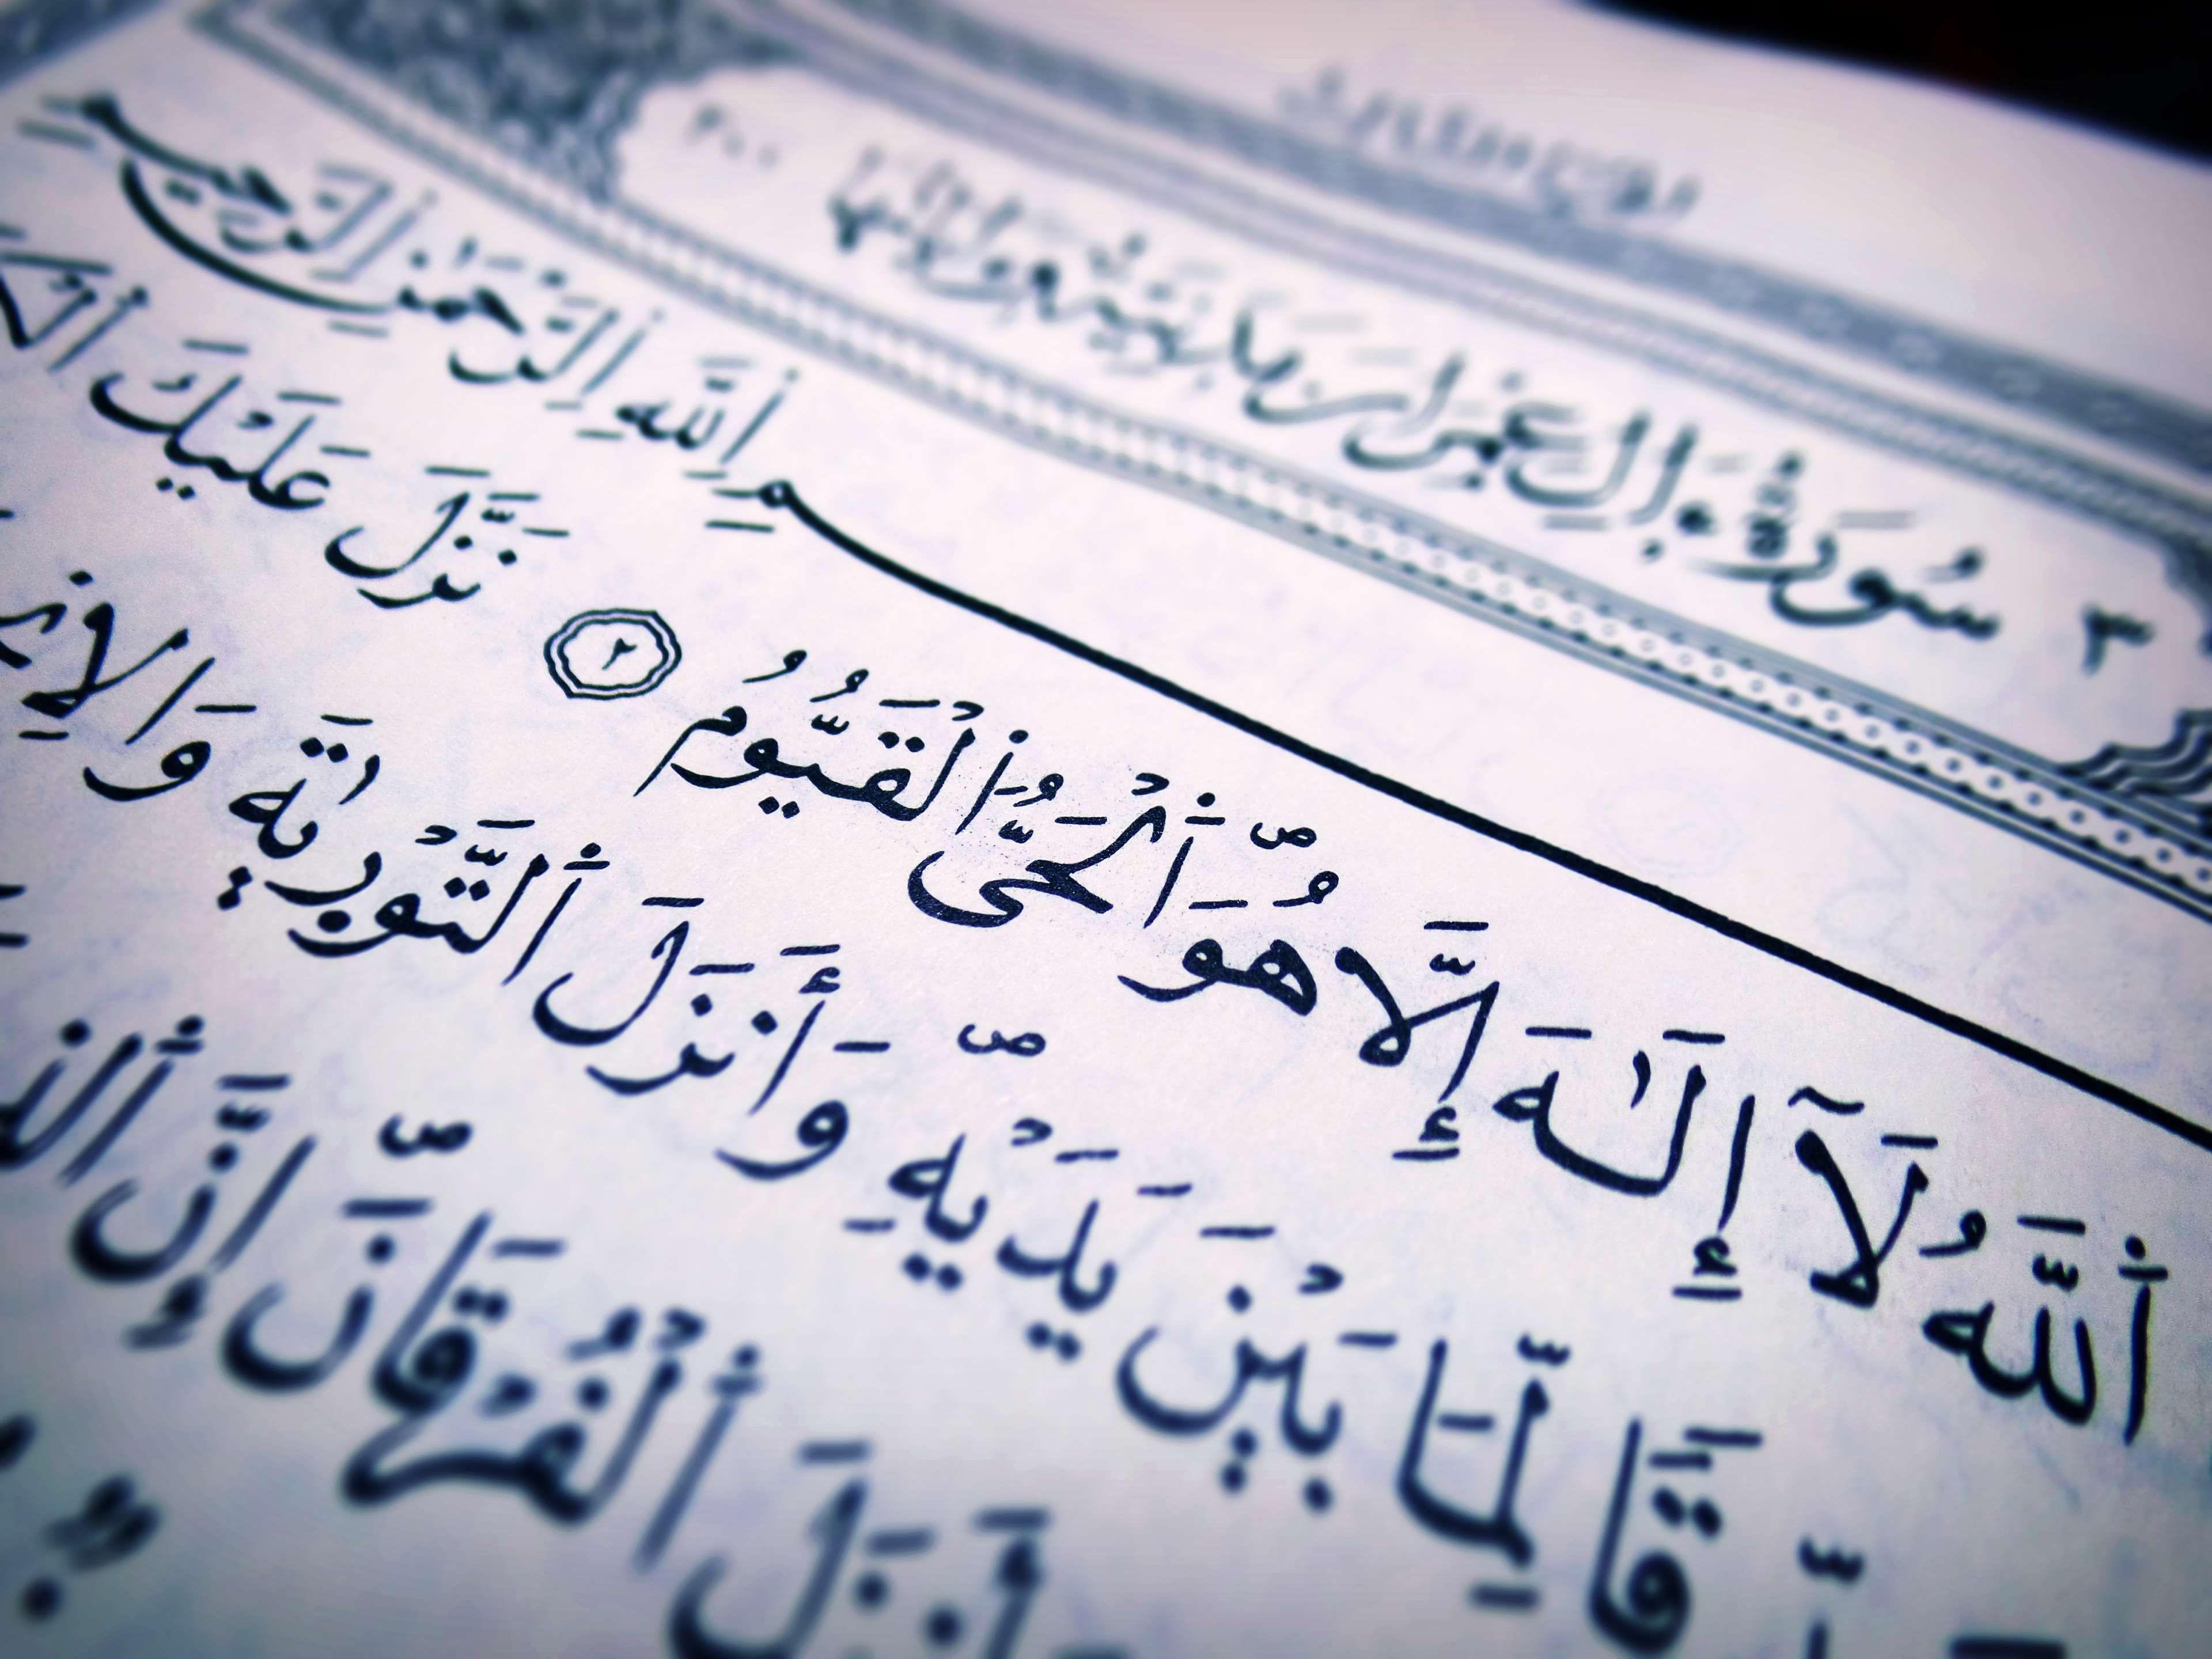 Allah Arab Arabic Background Book Document East Education